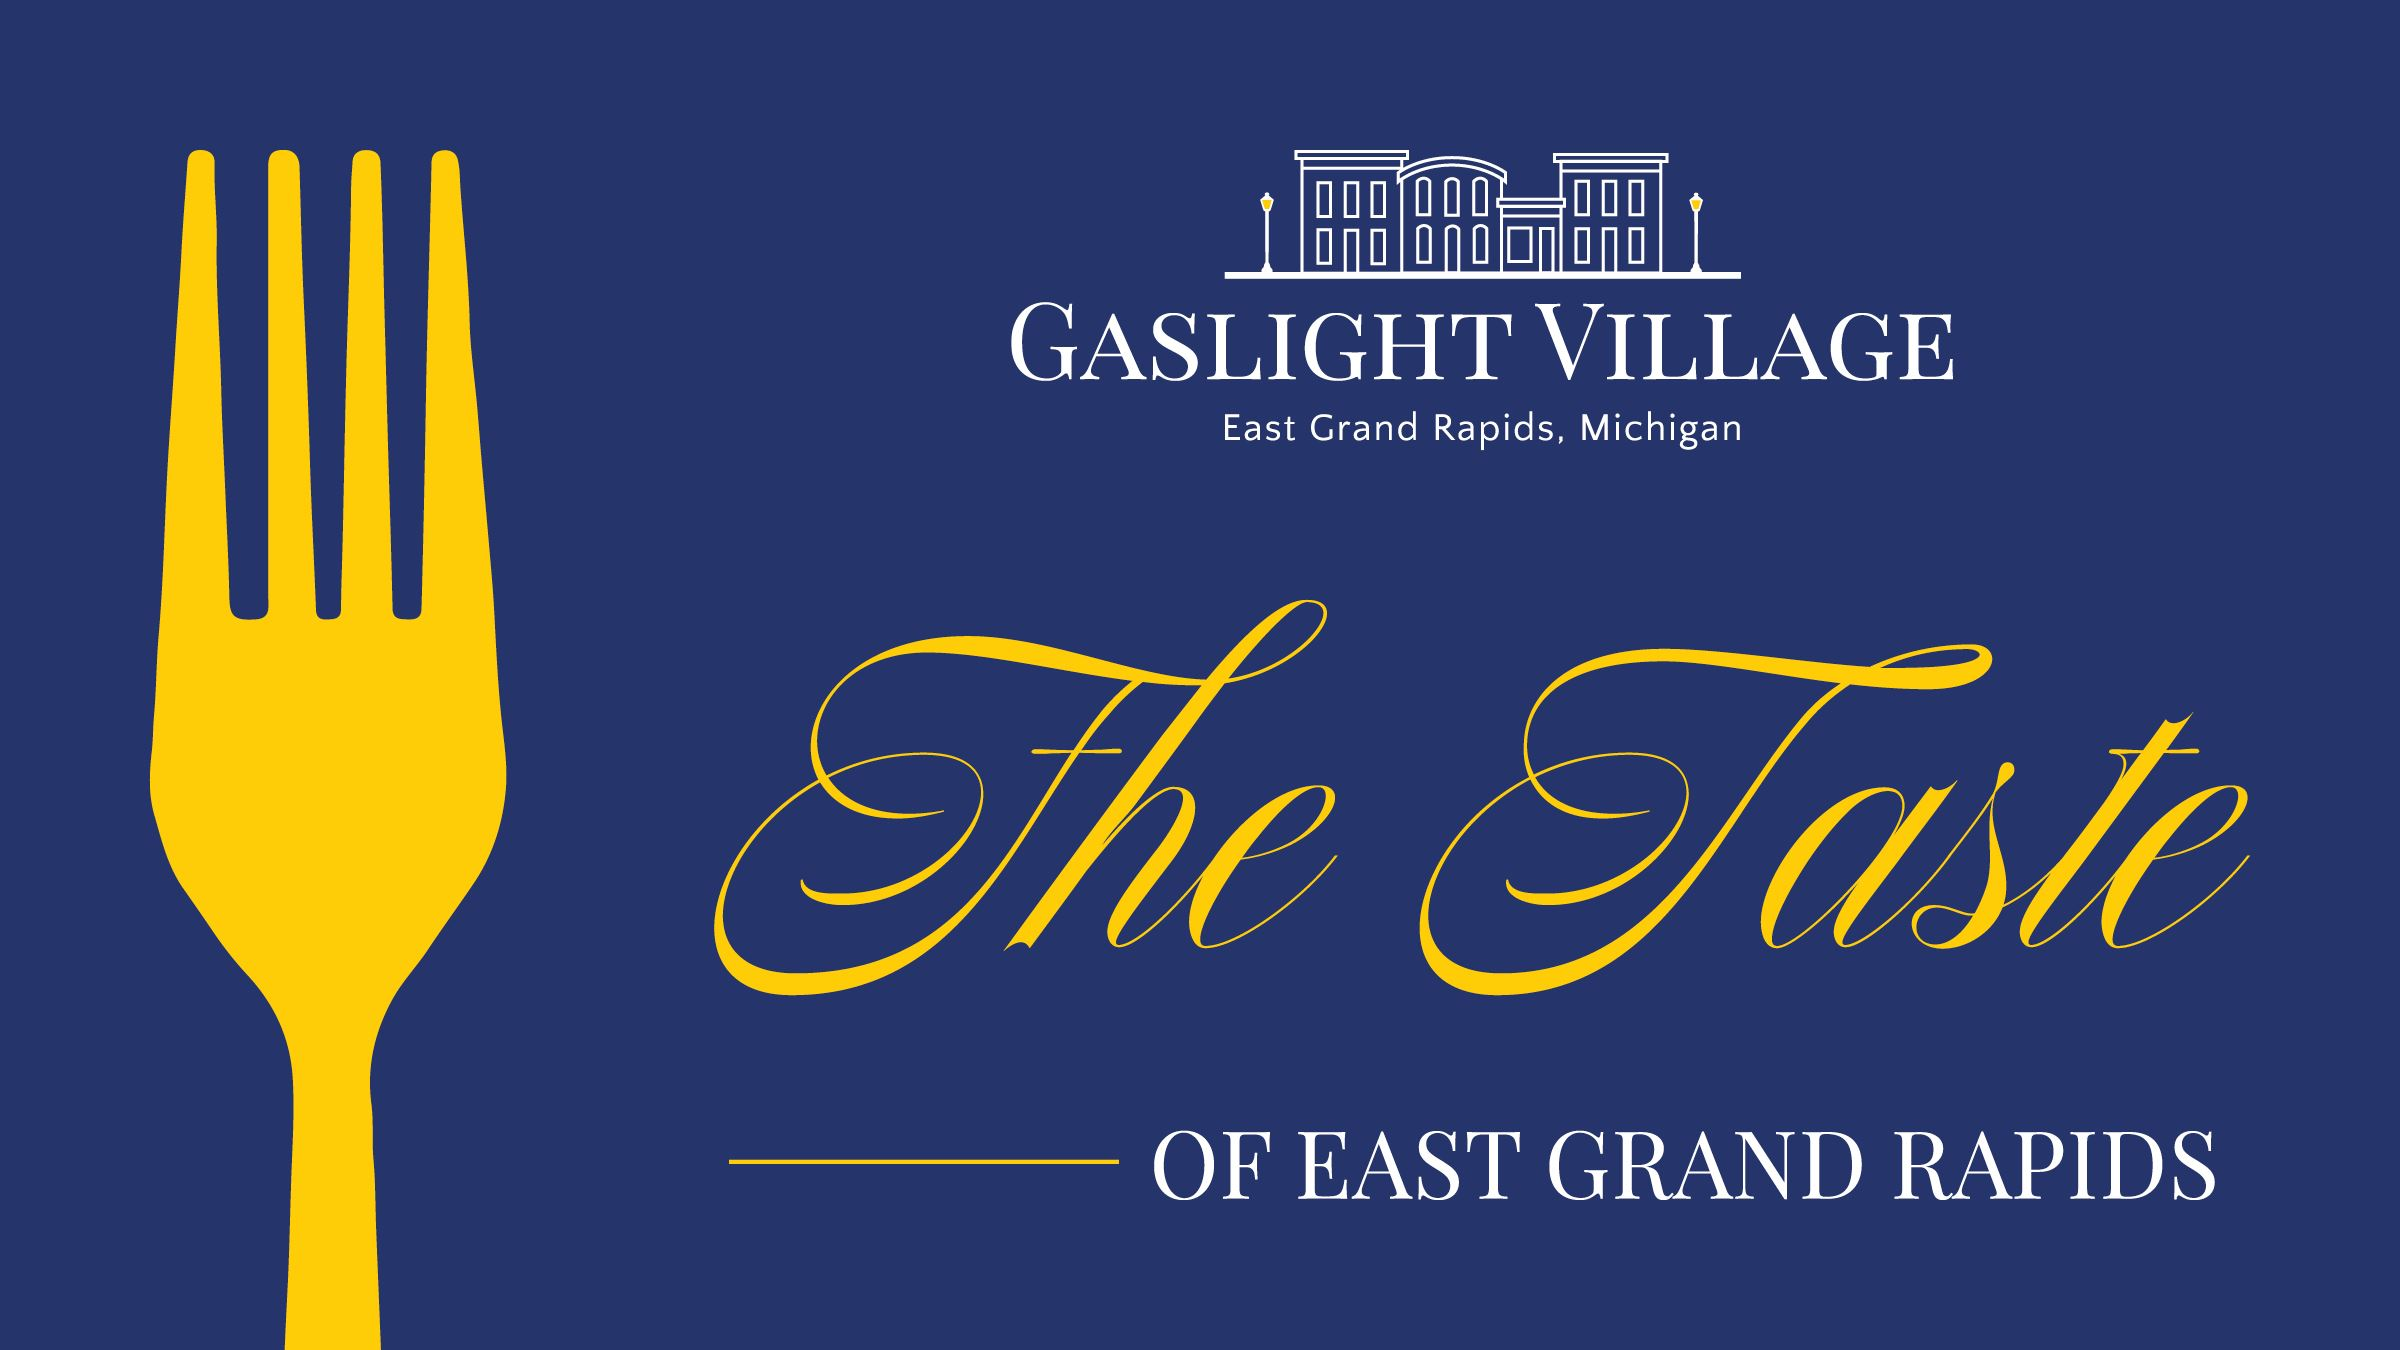 Taste of East Cover Photo